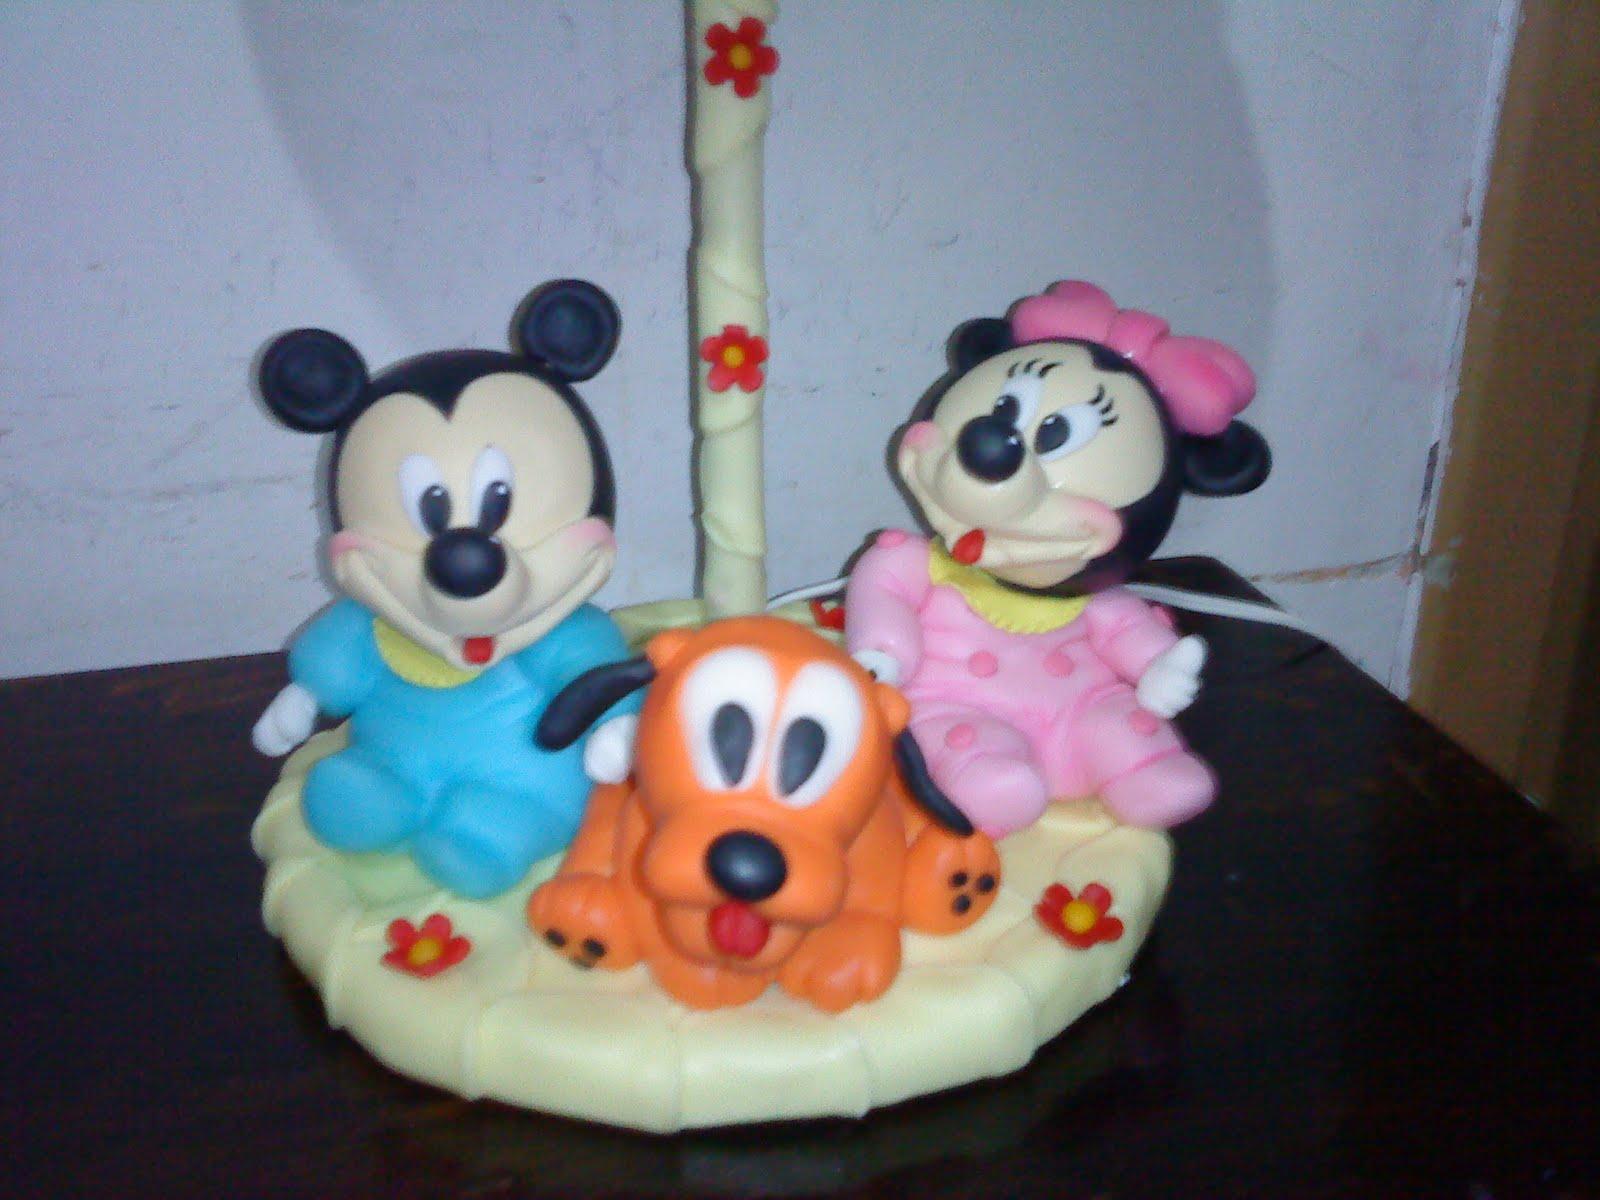 ... Mickey mouse, miny y pluto, porcelana fria: velador infantil bebé